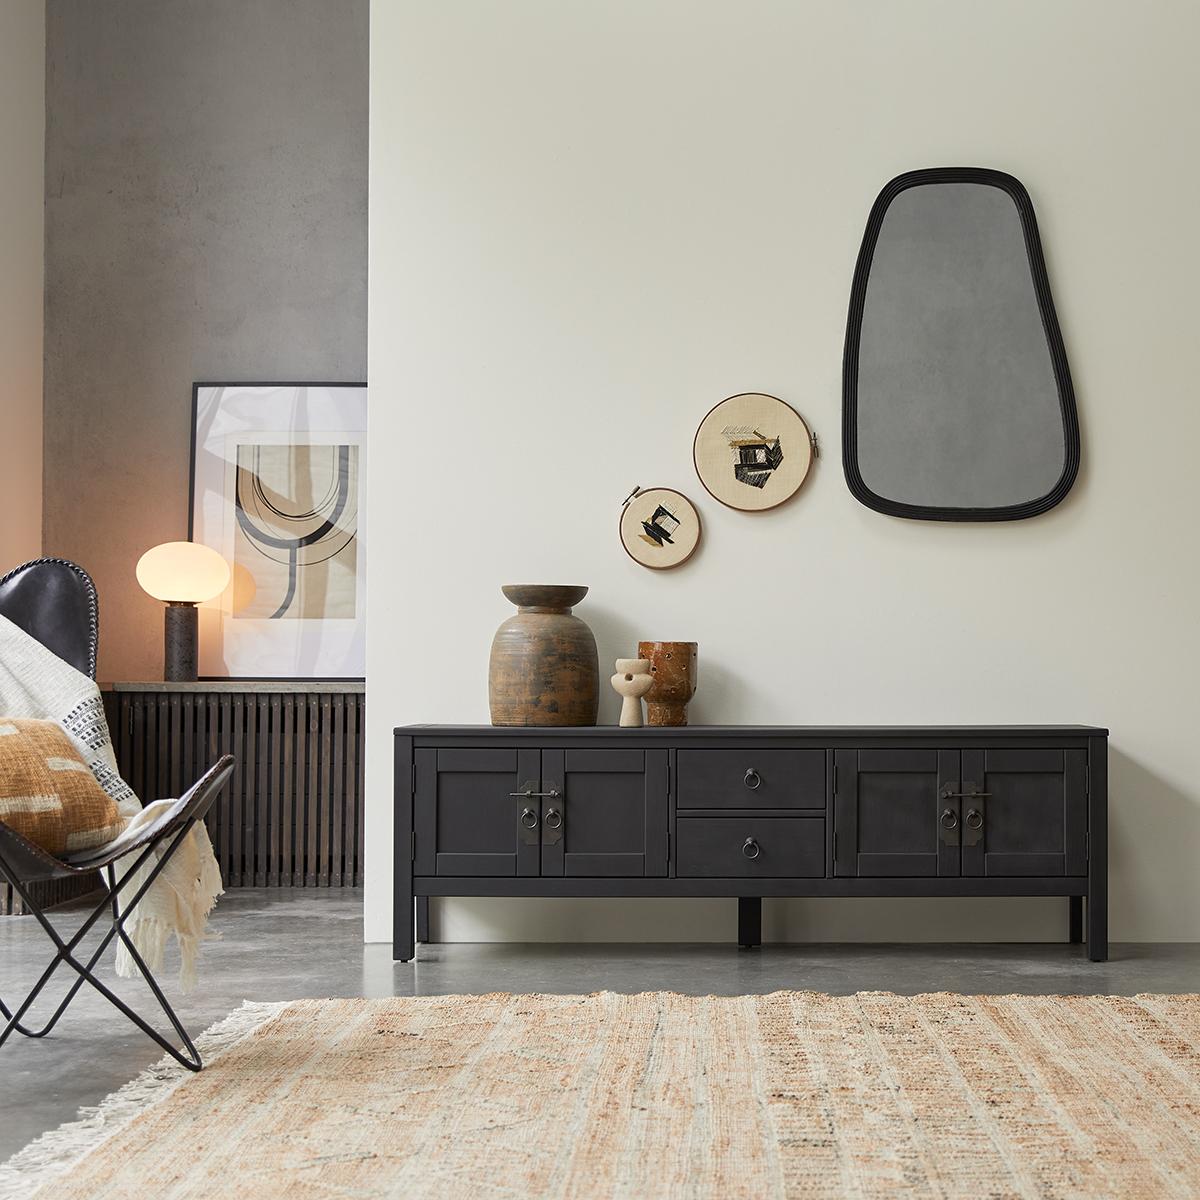 Thaki black mahogany TV Stand 170 cm